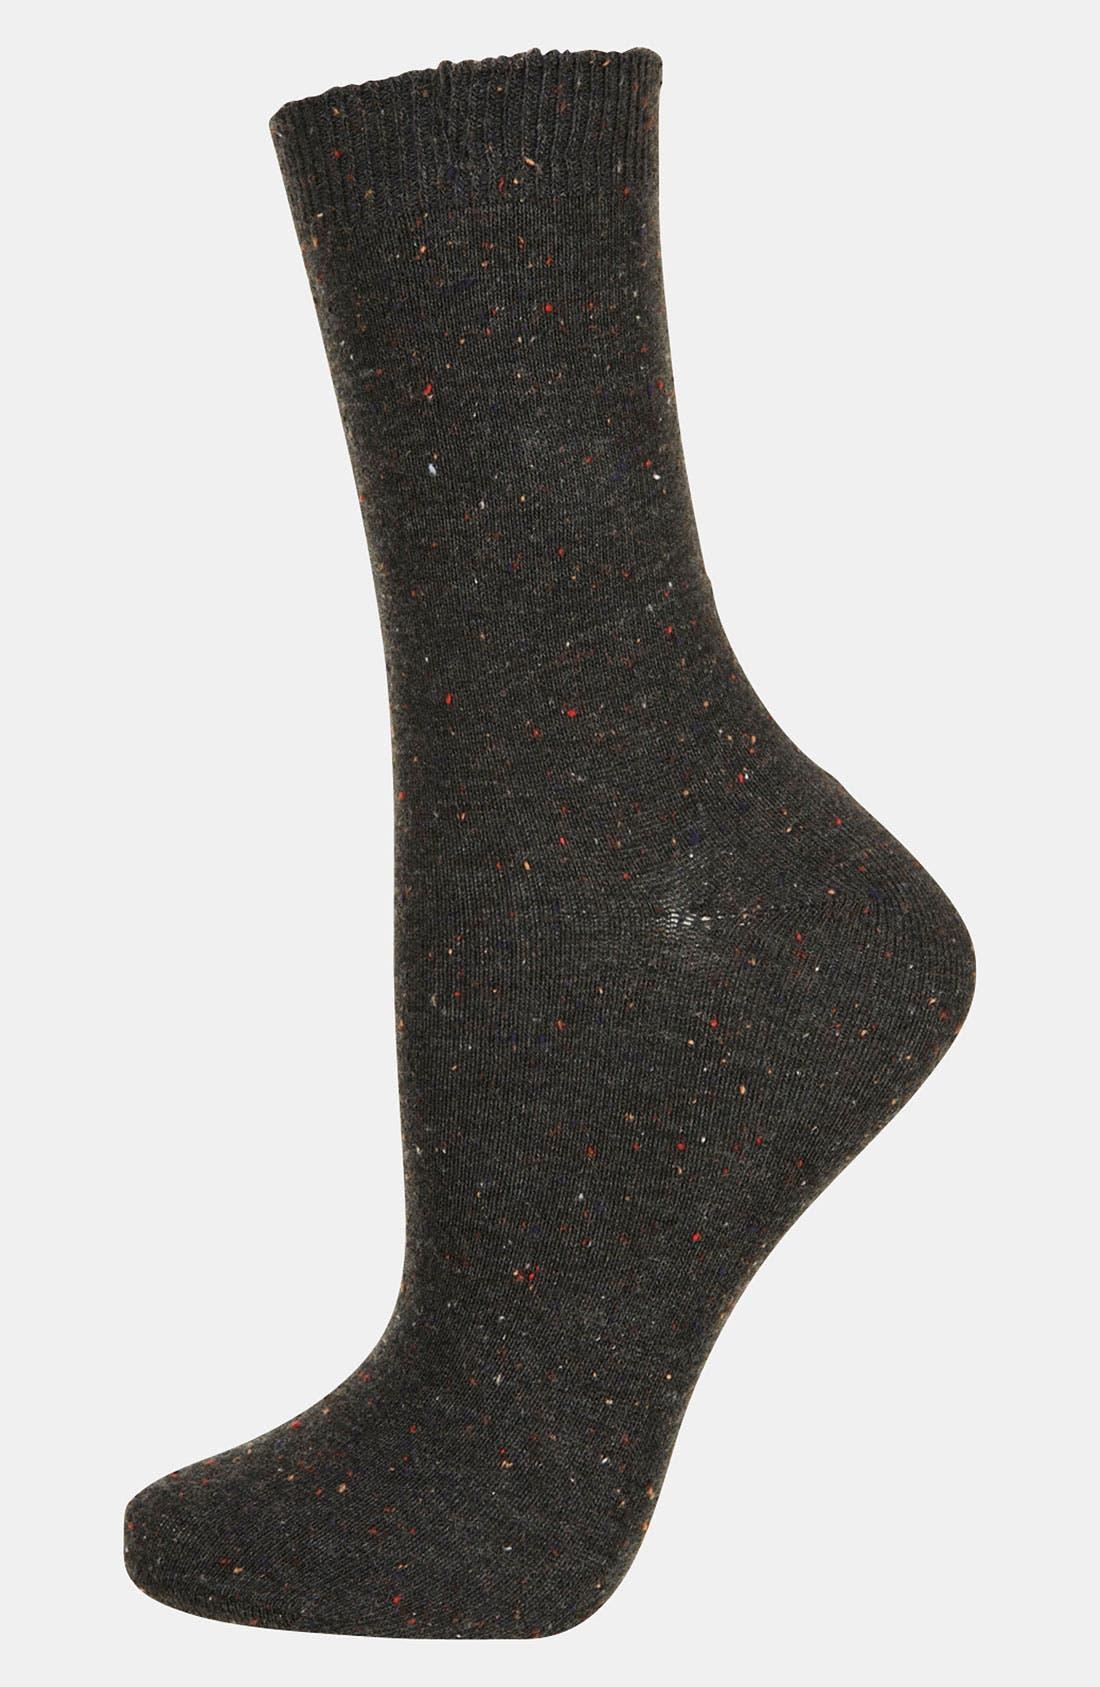 Alternate Image 1 Selected - Topshop 'Nep' Socks